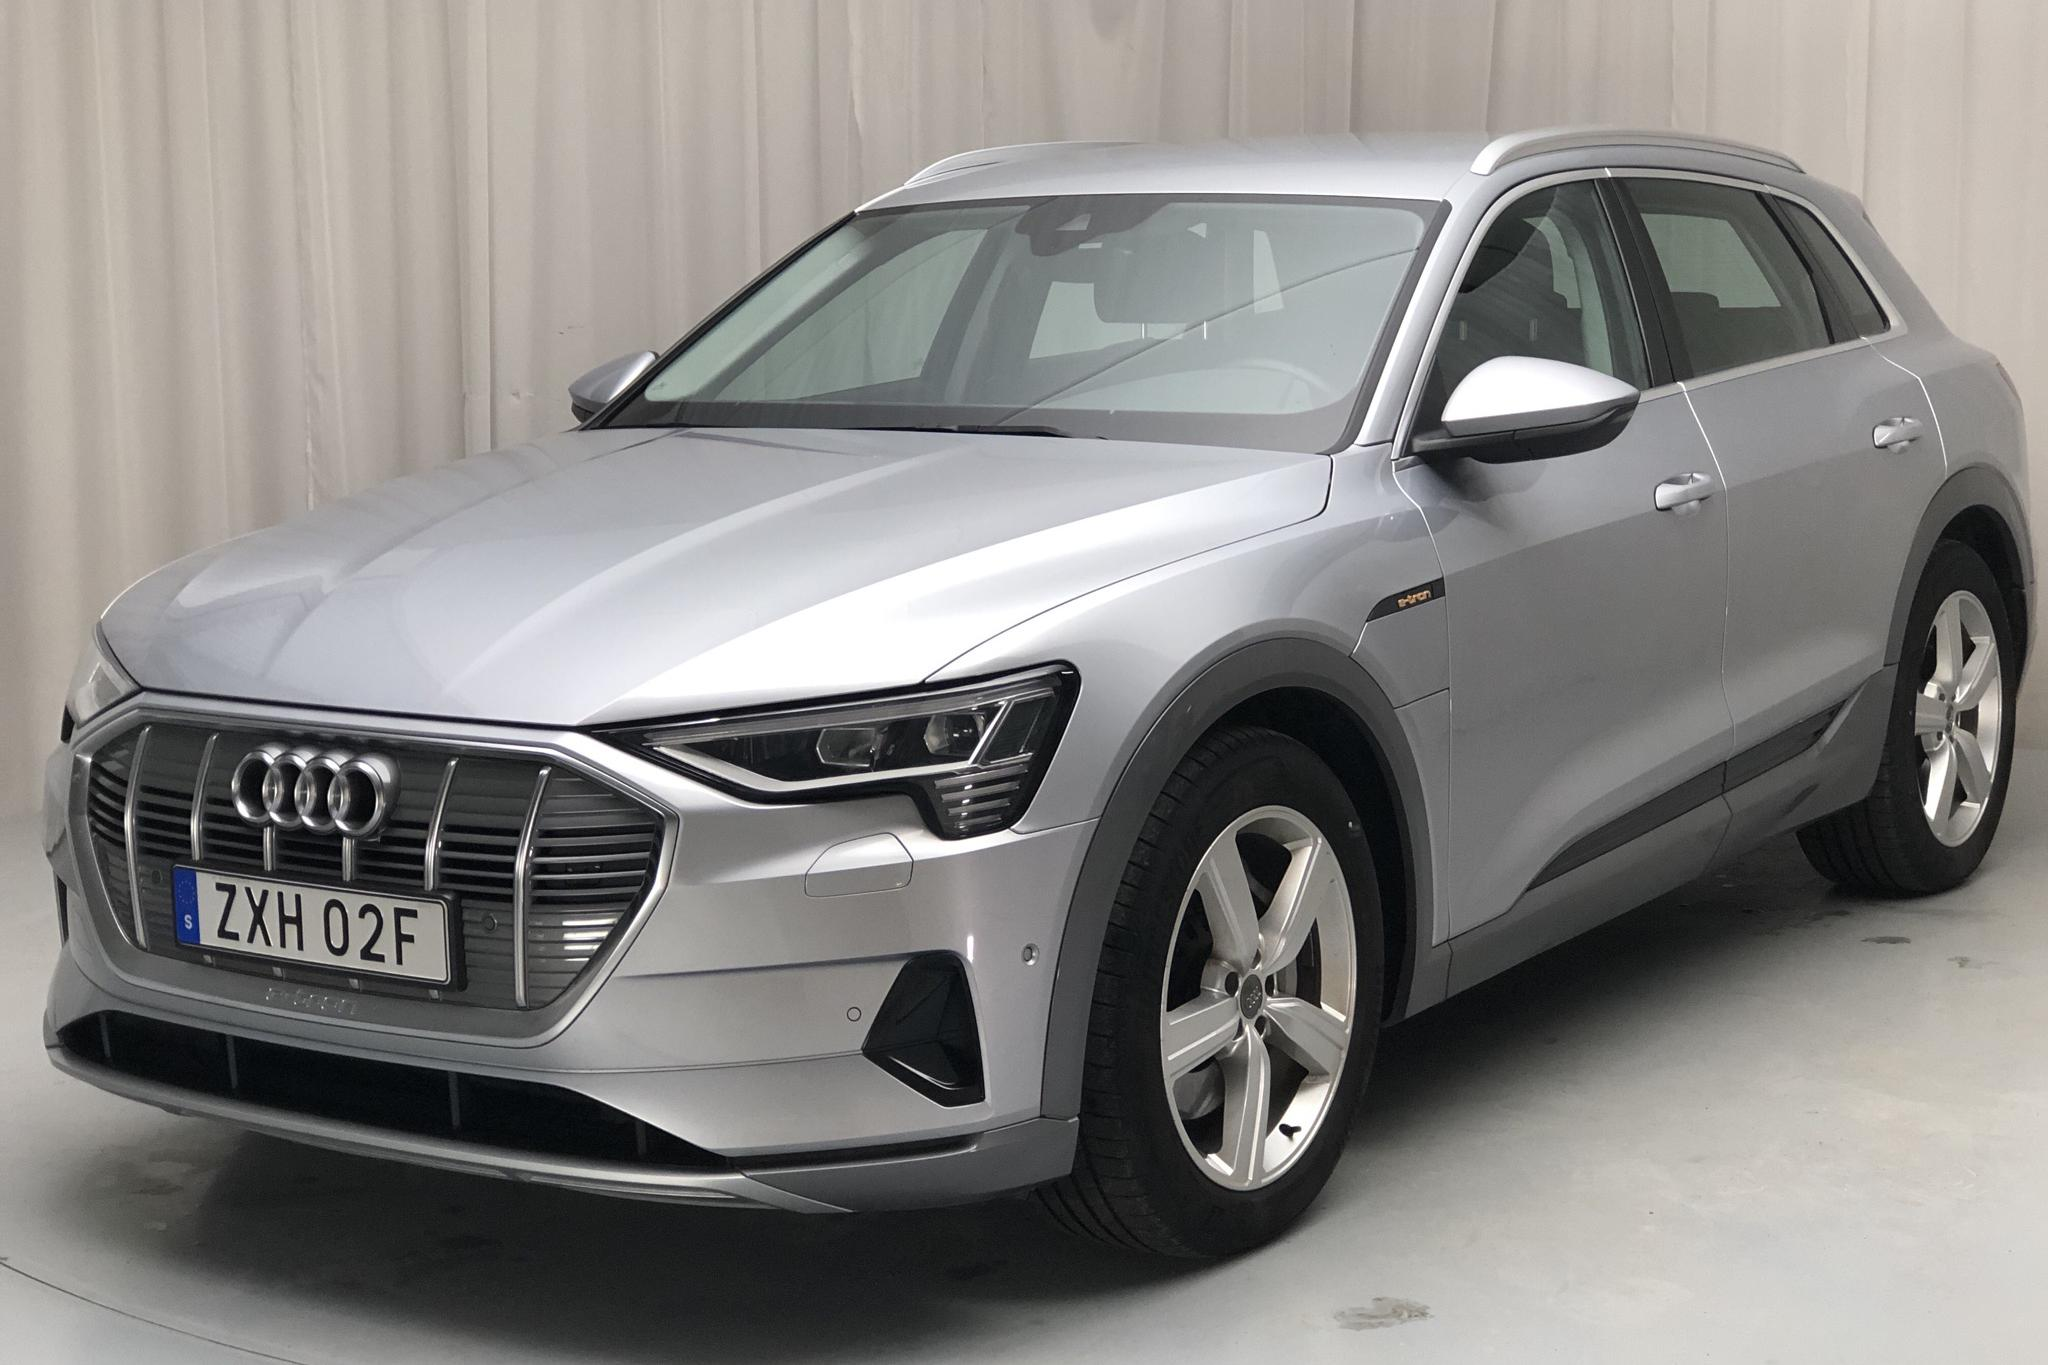 Audi e-tron 50 quattro 71 kWh (288hk)